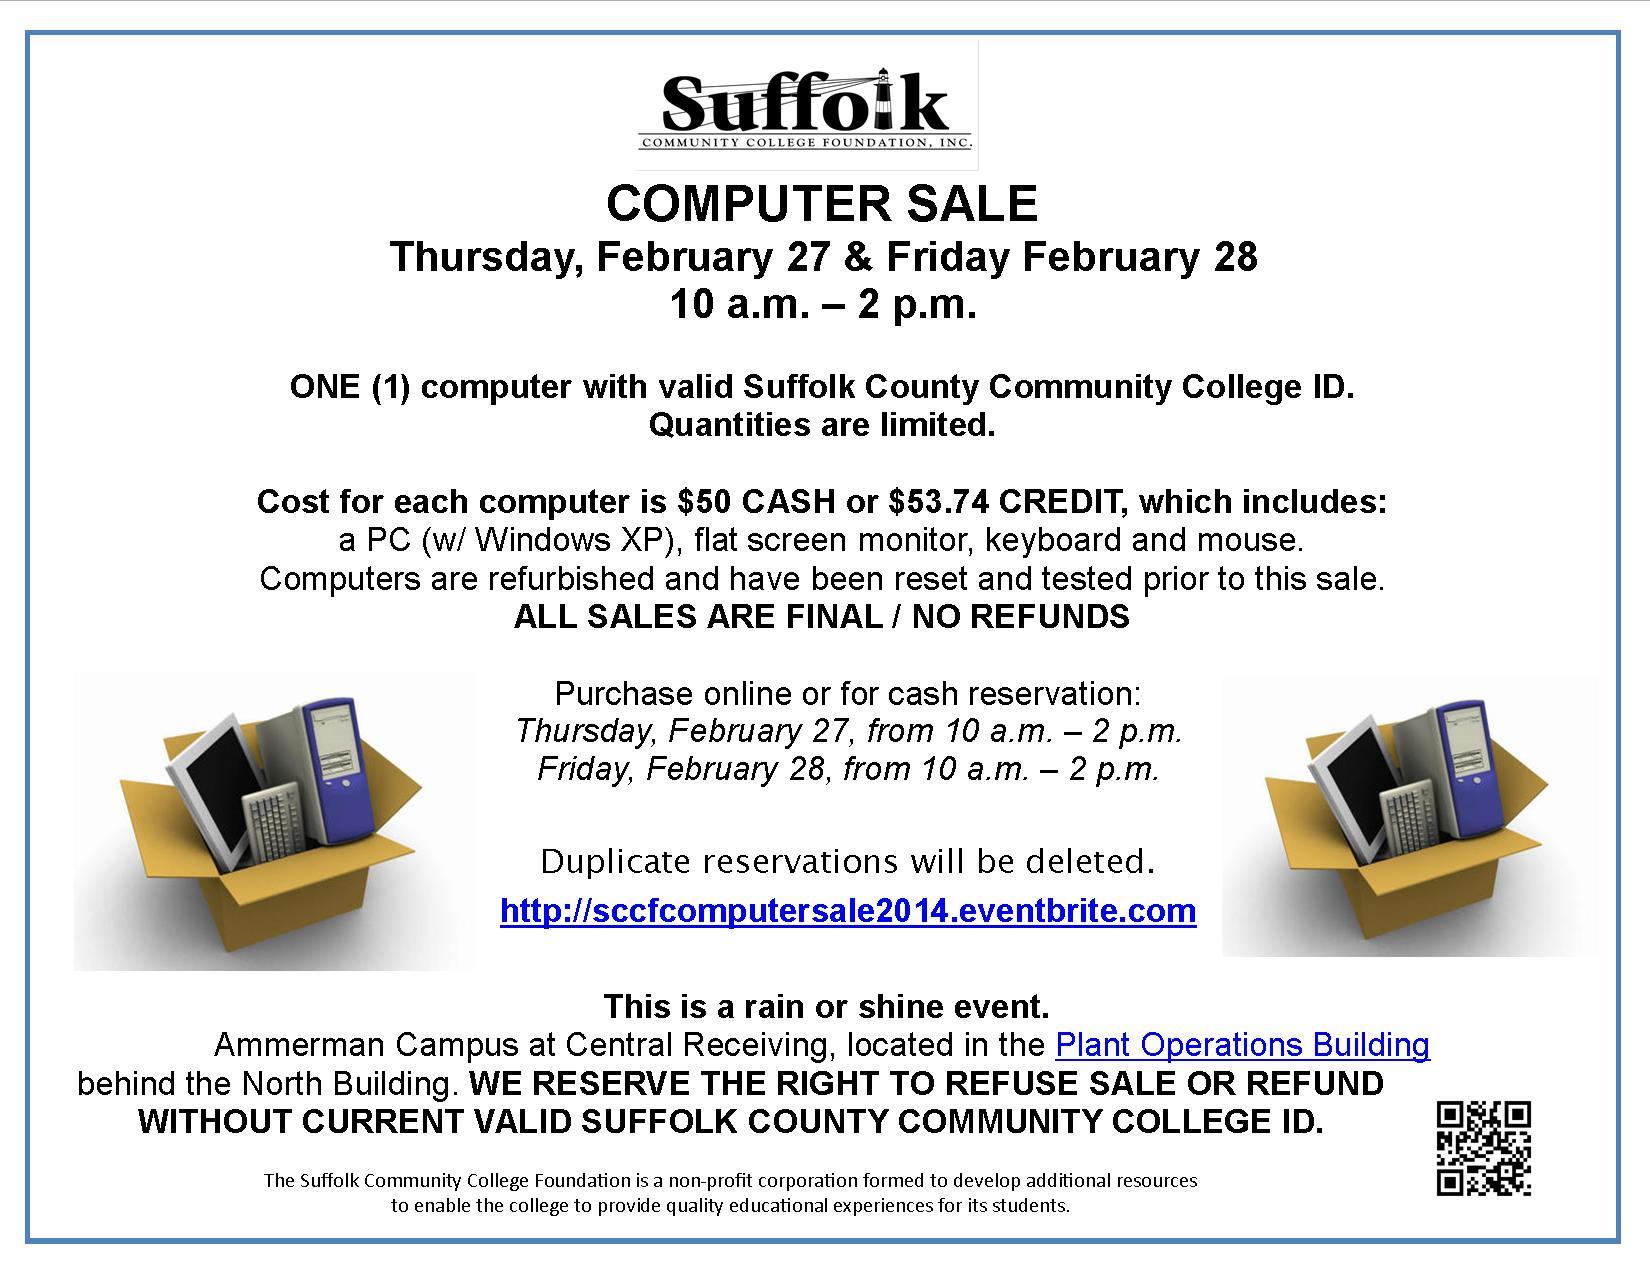 Suffolk Community College Foundation Computer Sale Flyer